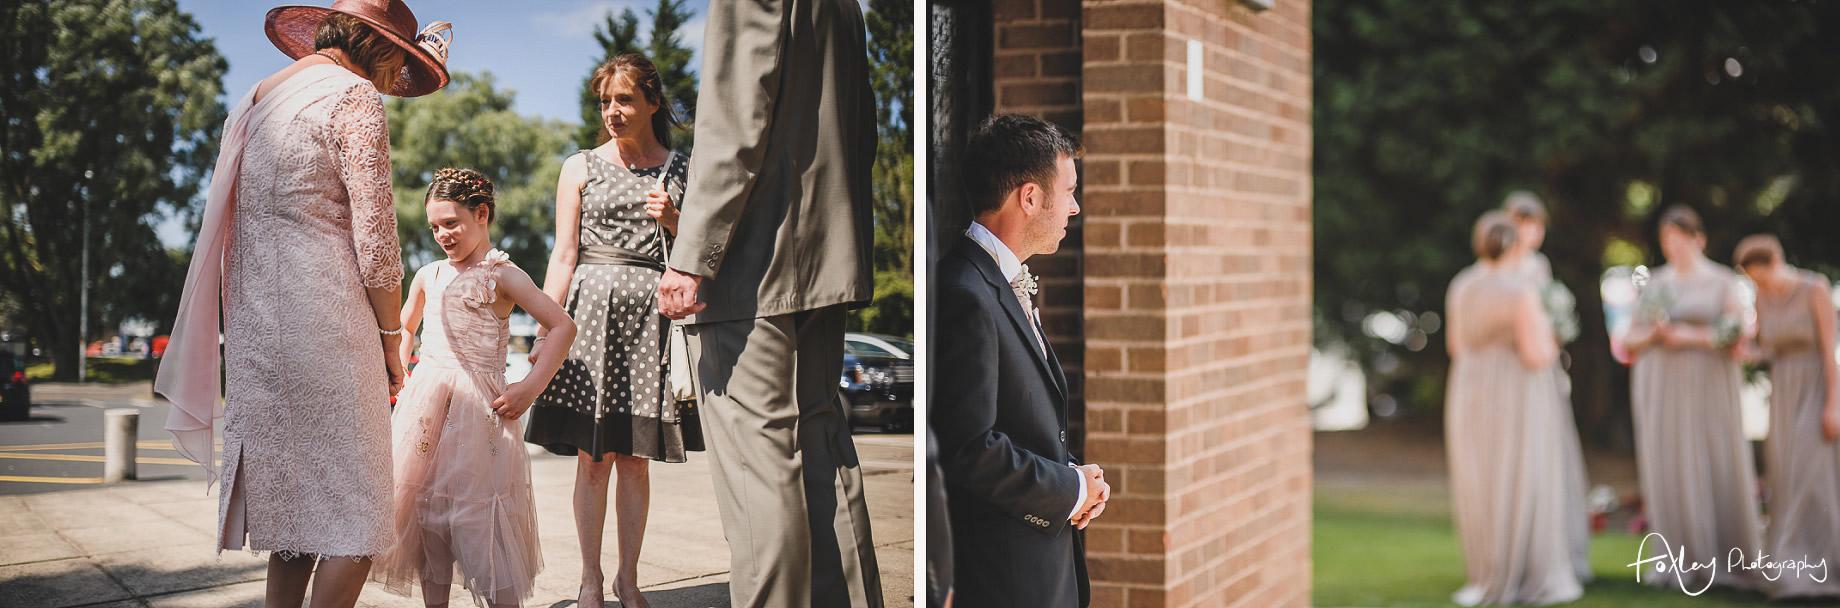 Rebecca and Dan Wedding at Preston Marriott Hotel 040